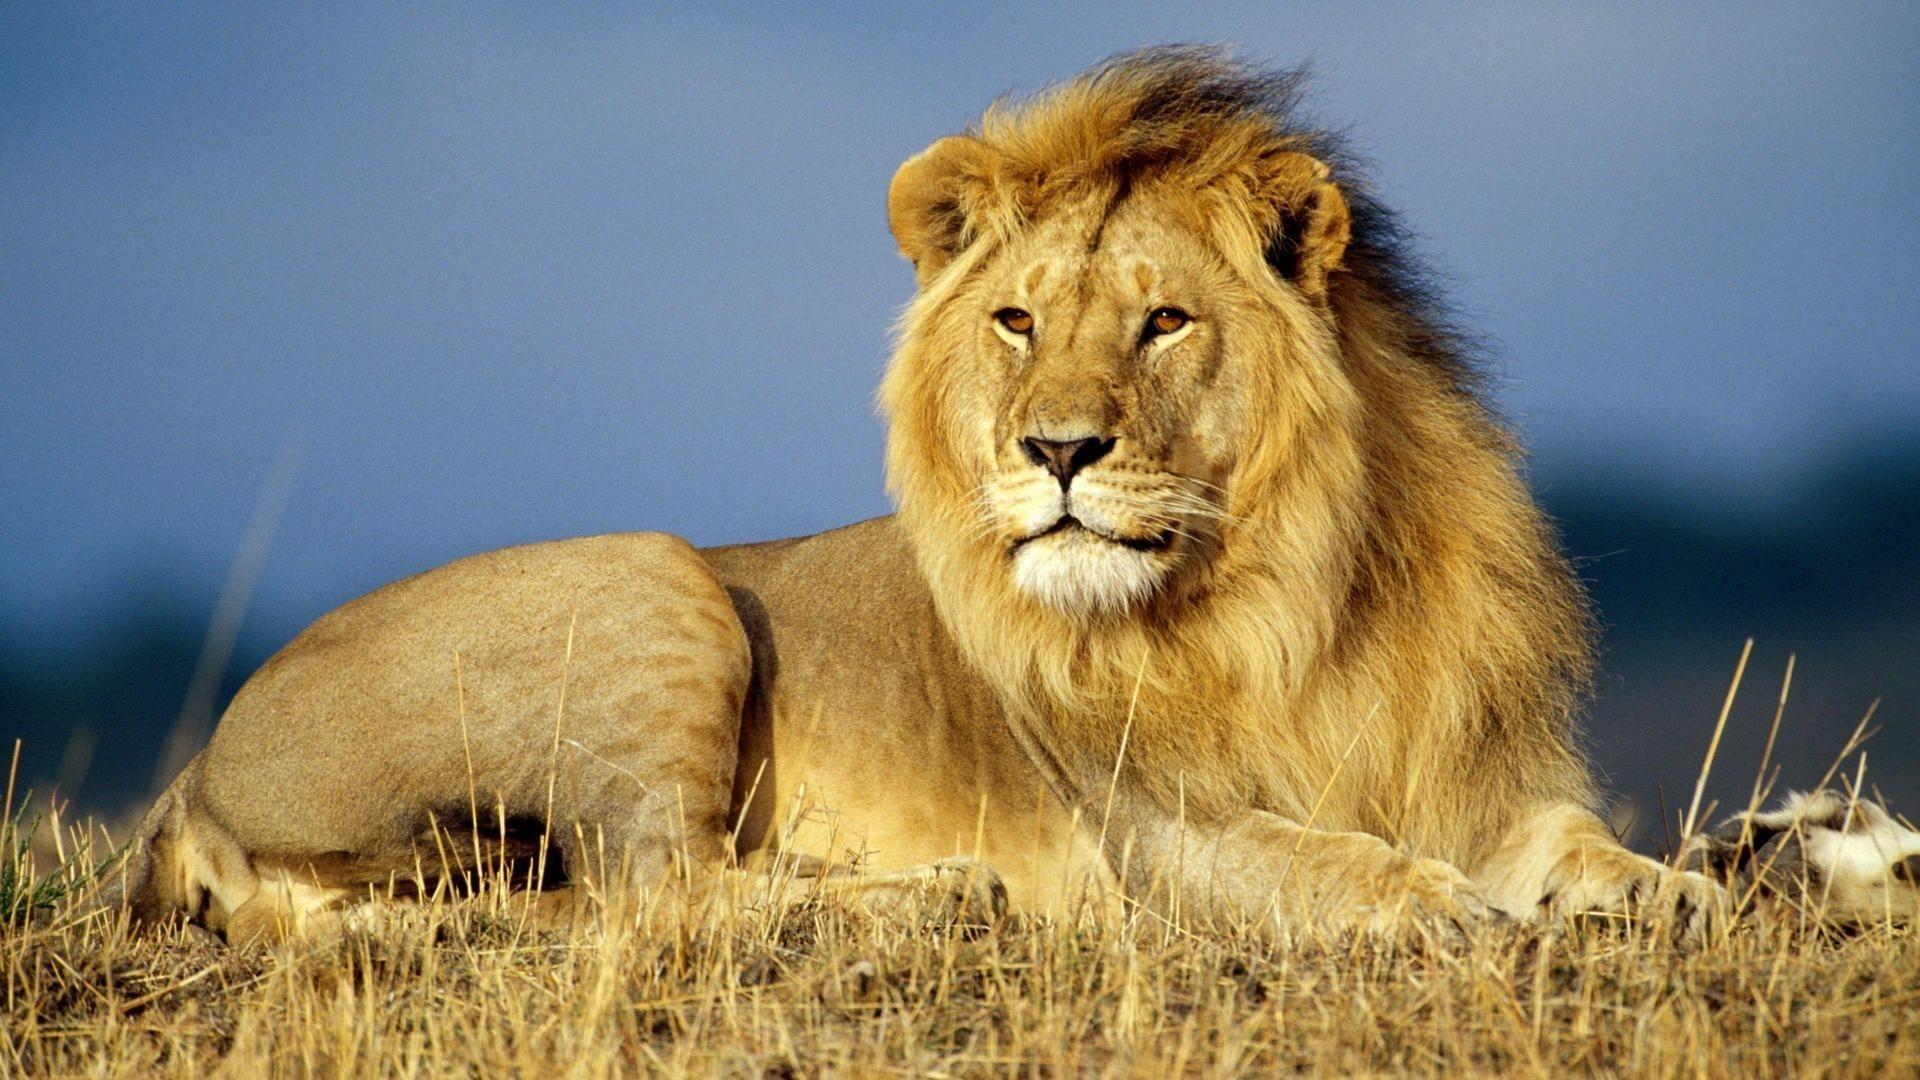 African Lion 1080p Hd Wallpaper Asian Lion Lion Wallpaper Lion